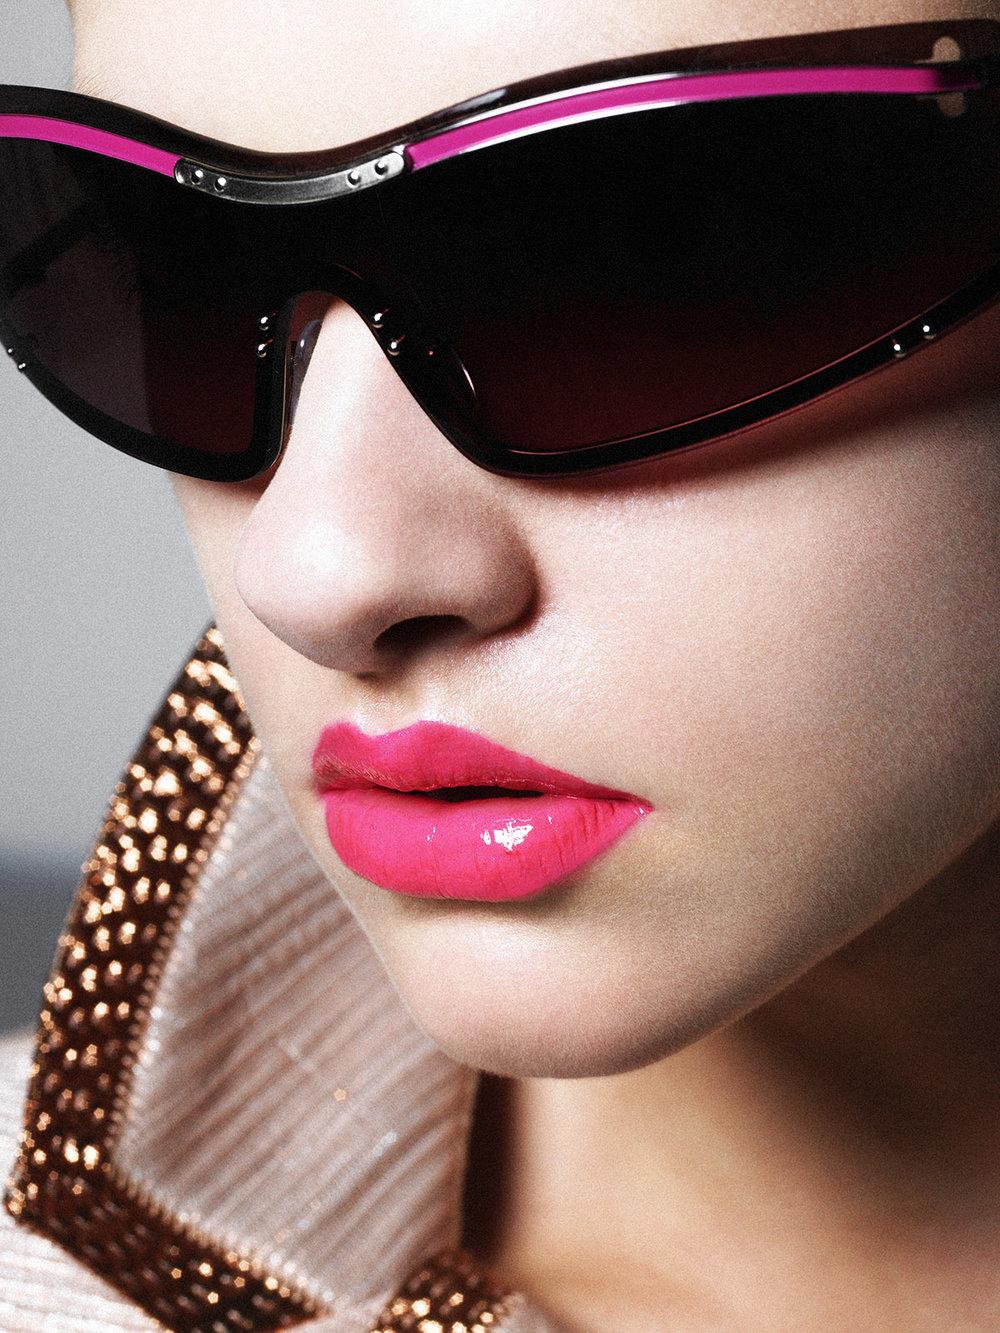 kwp-style-lip-4.jpg